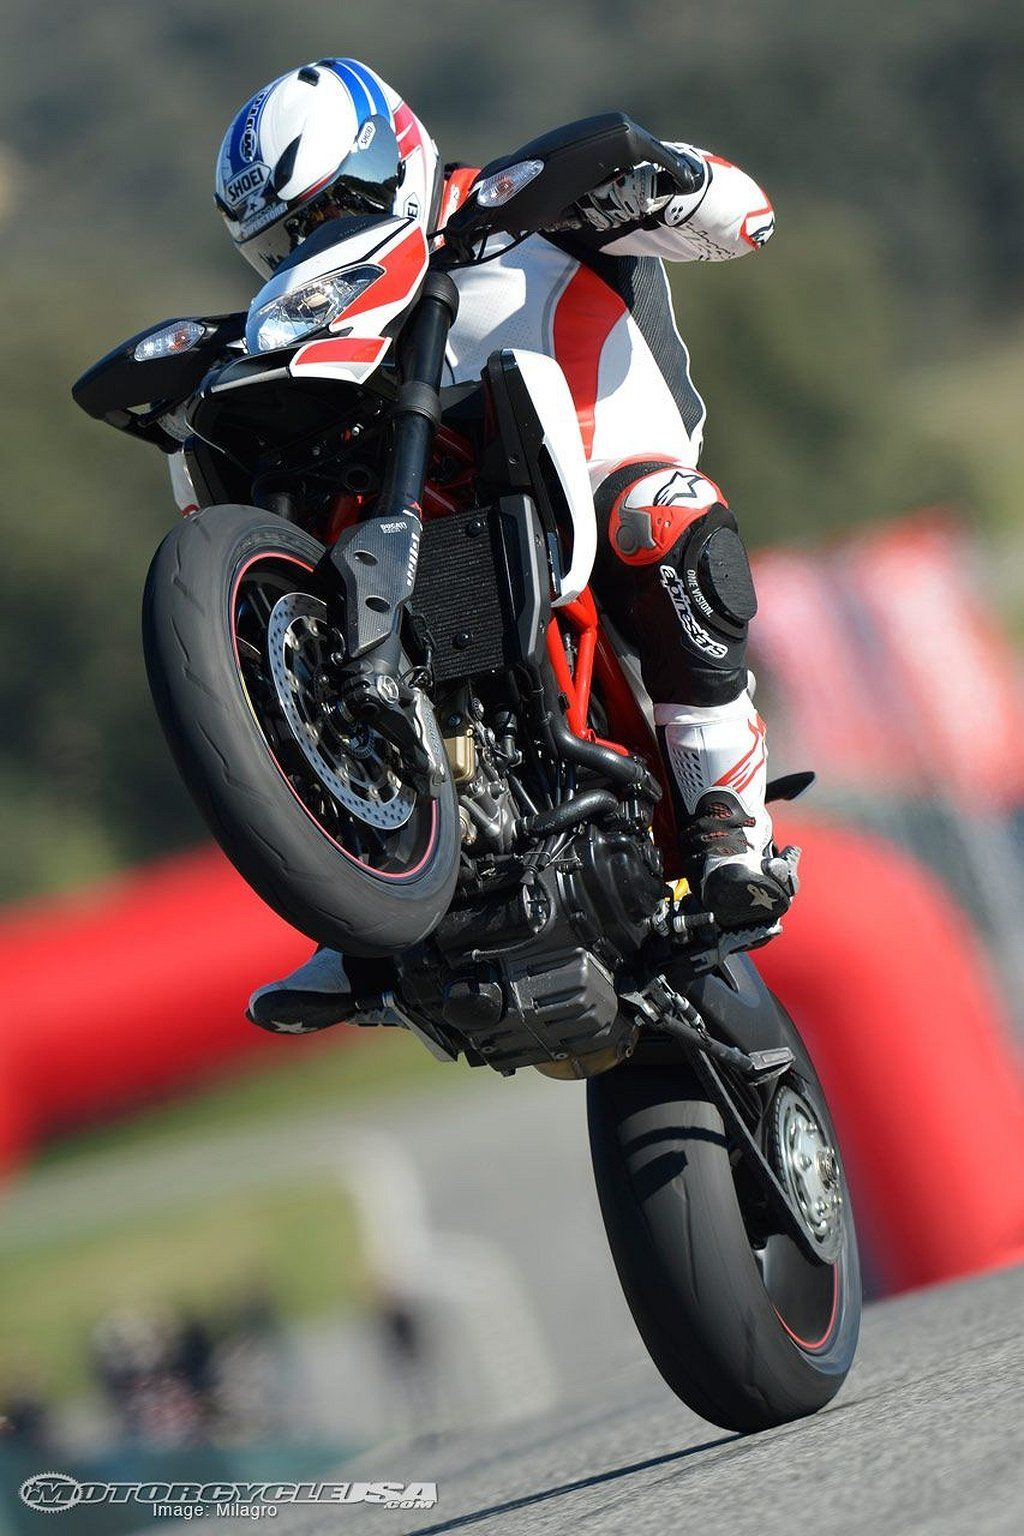 Pin by mohamad paiz on Motorcycle Ducati hypermotard